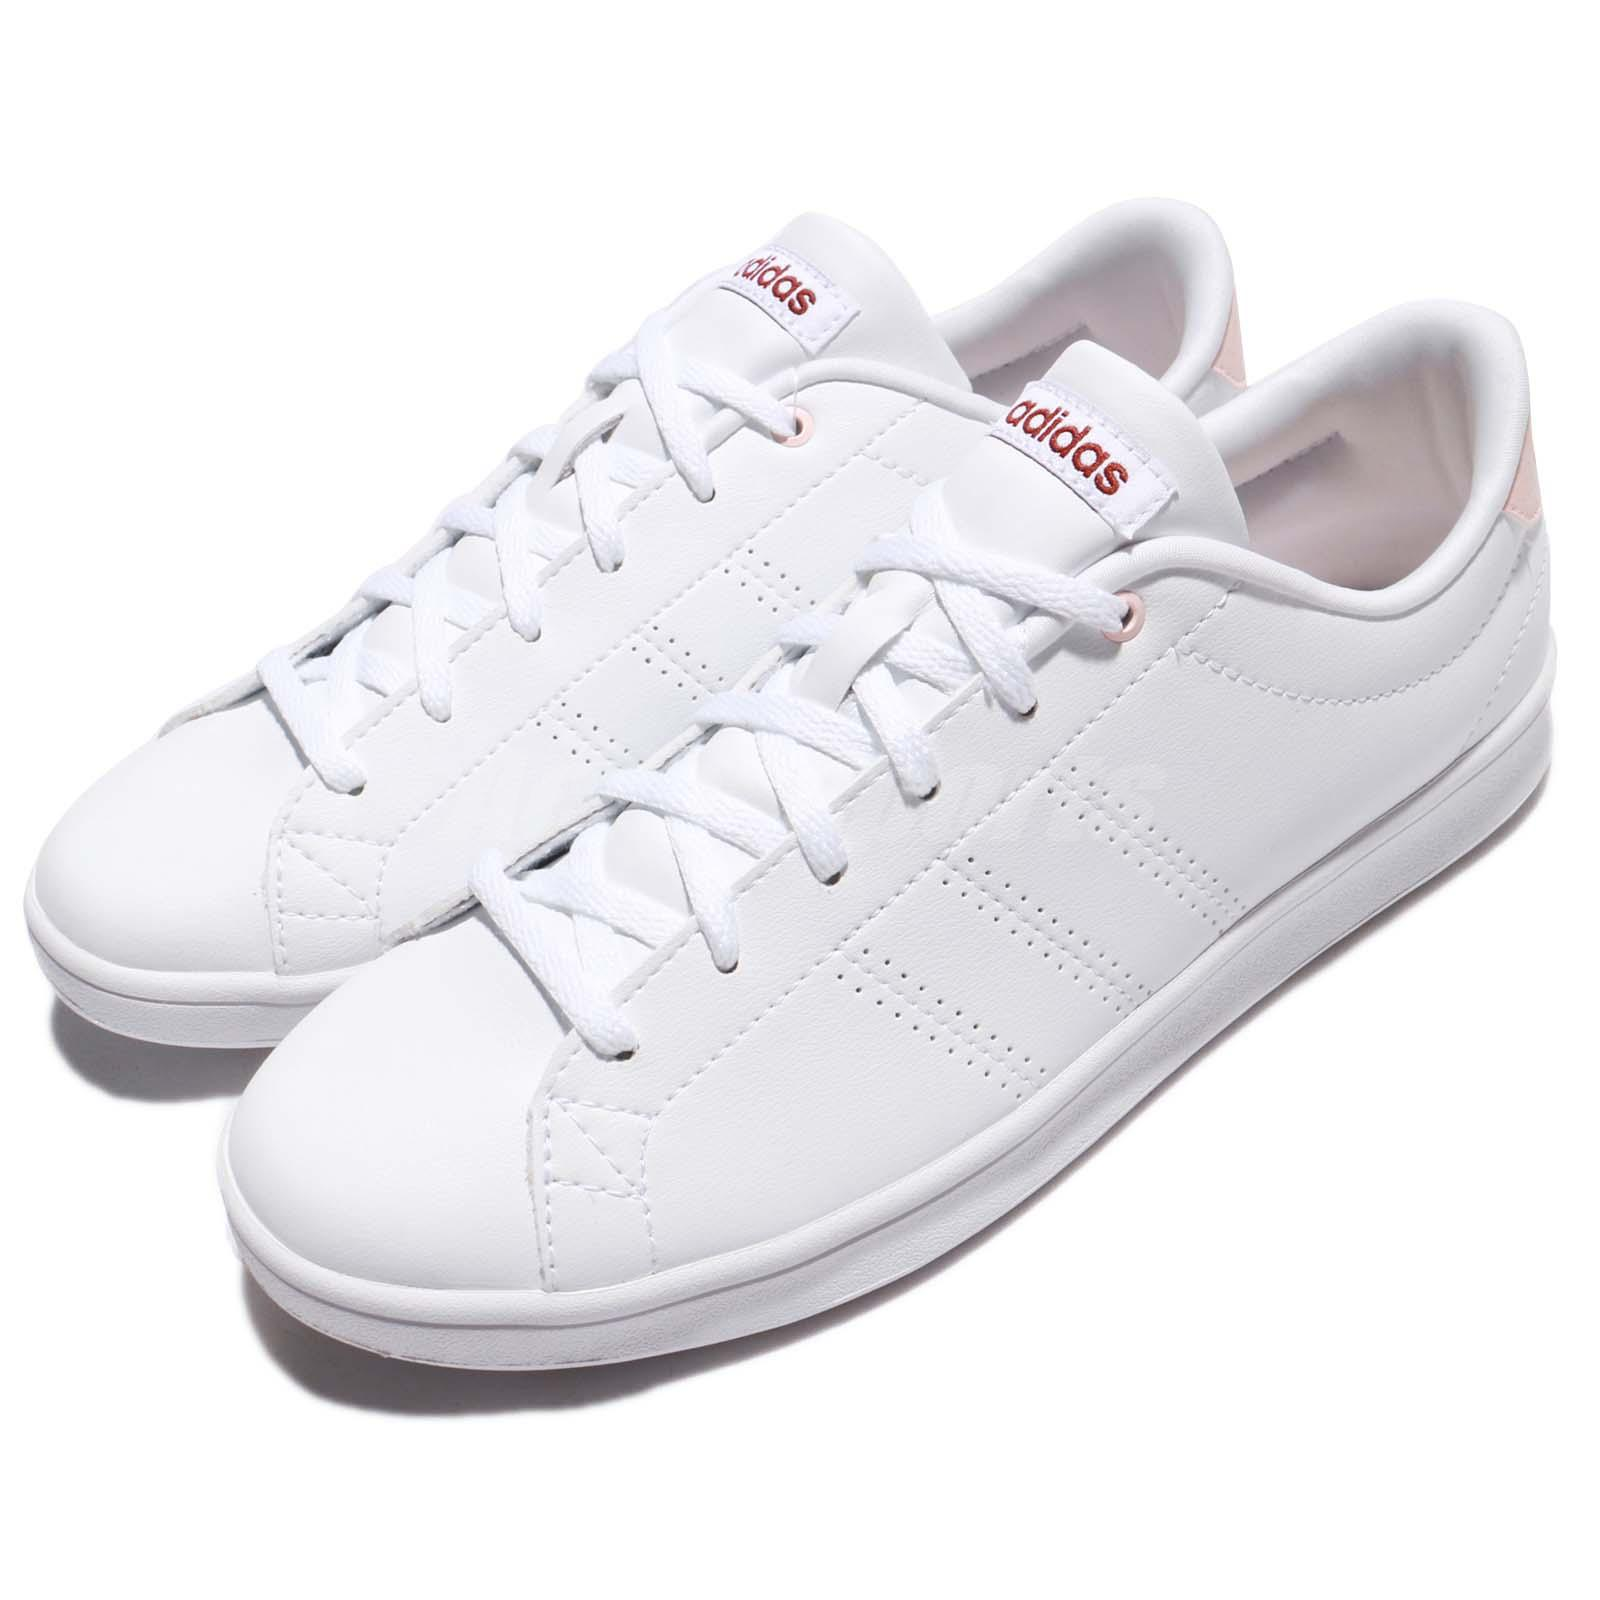 hot sale online 4b9fe 9bc28 Détails  adidas Neo Advantage CL Clean QT W White Mystery Ruby Pink Women  Shoes BB9611